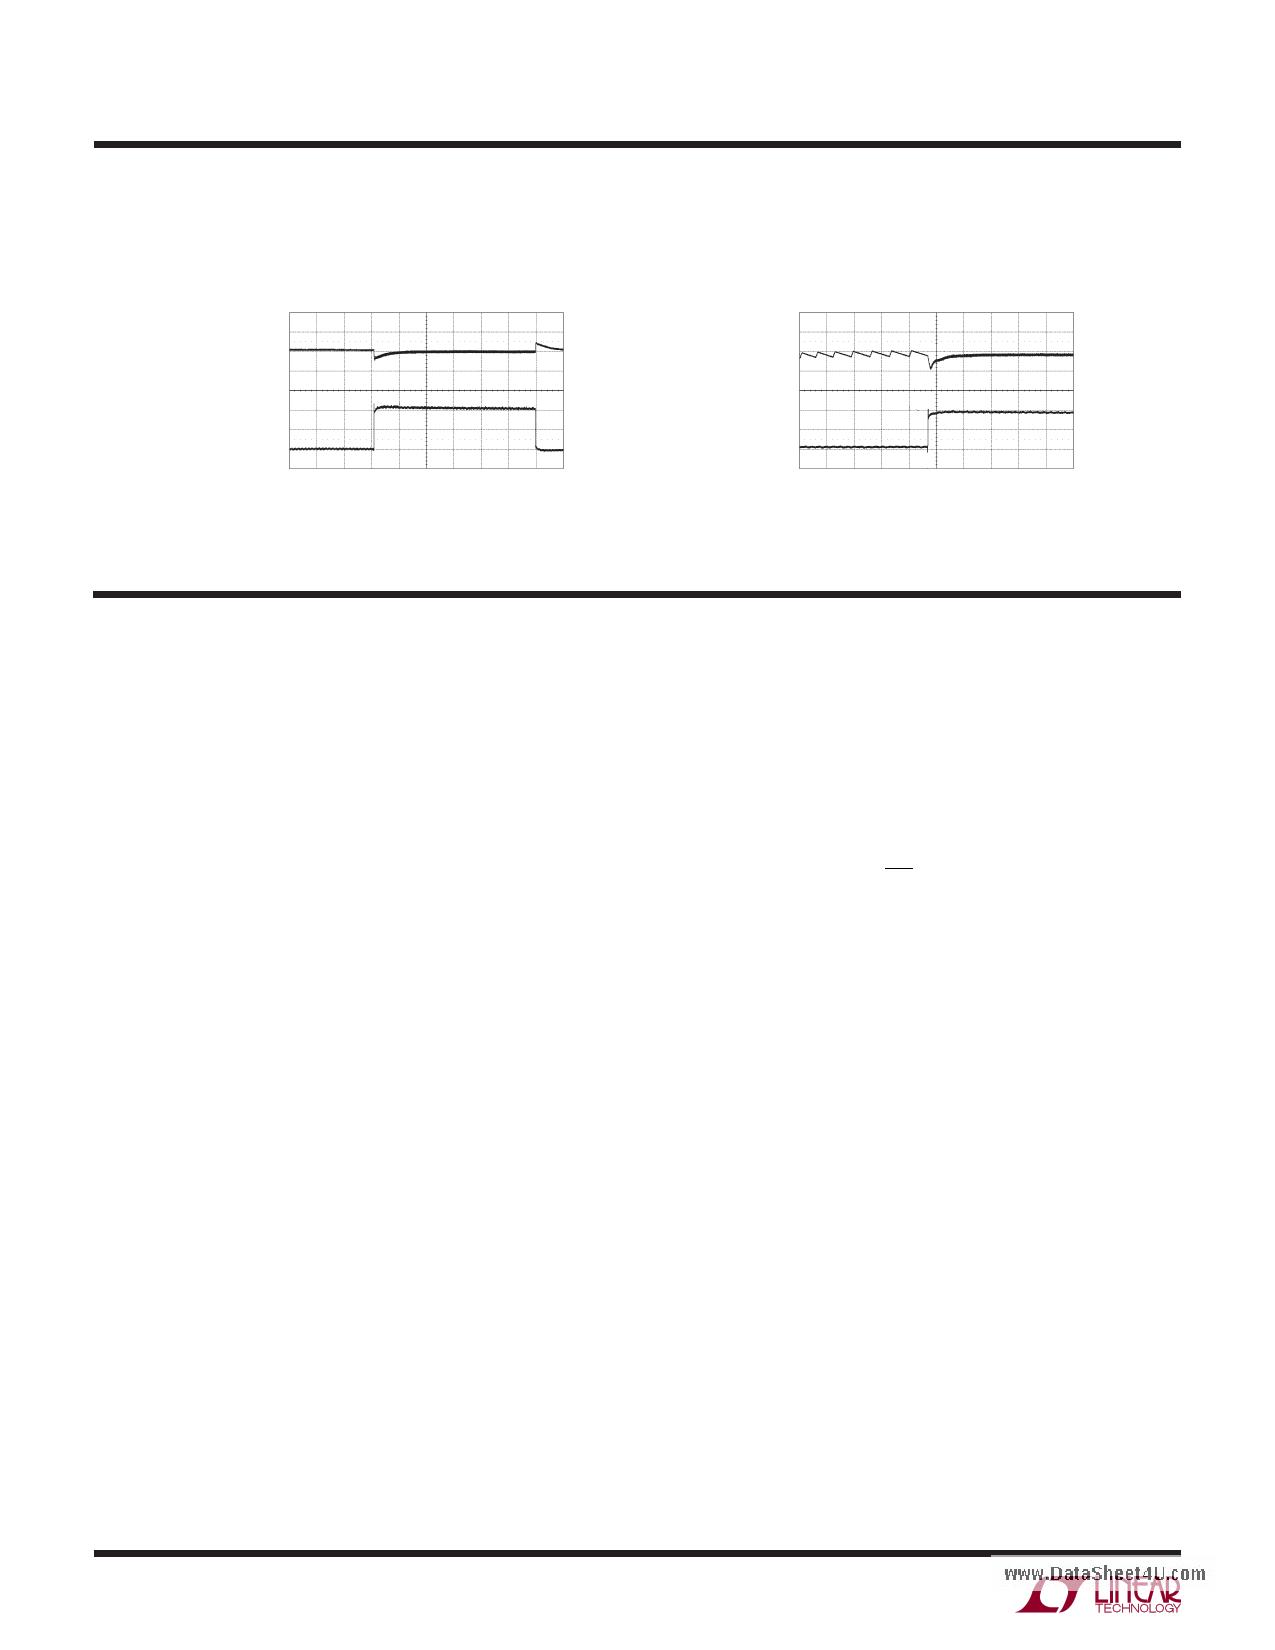 LTC3526 電子部品, 半導体